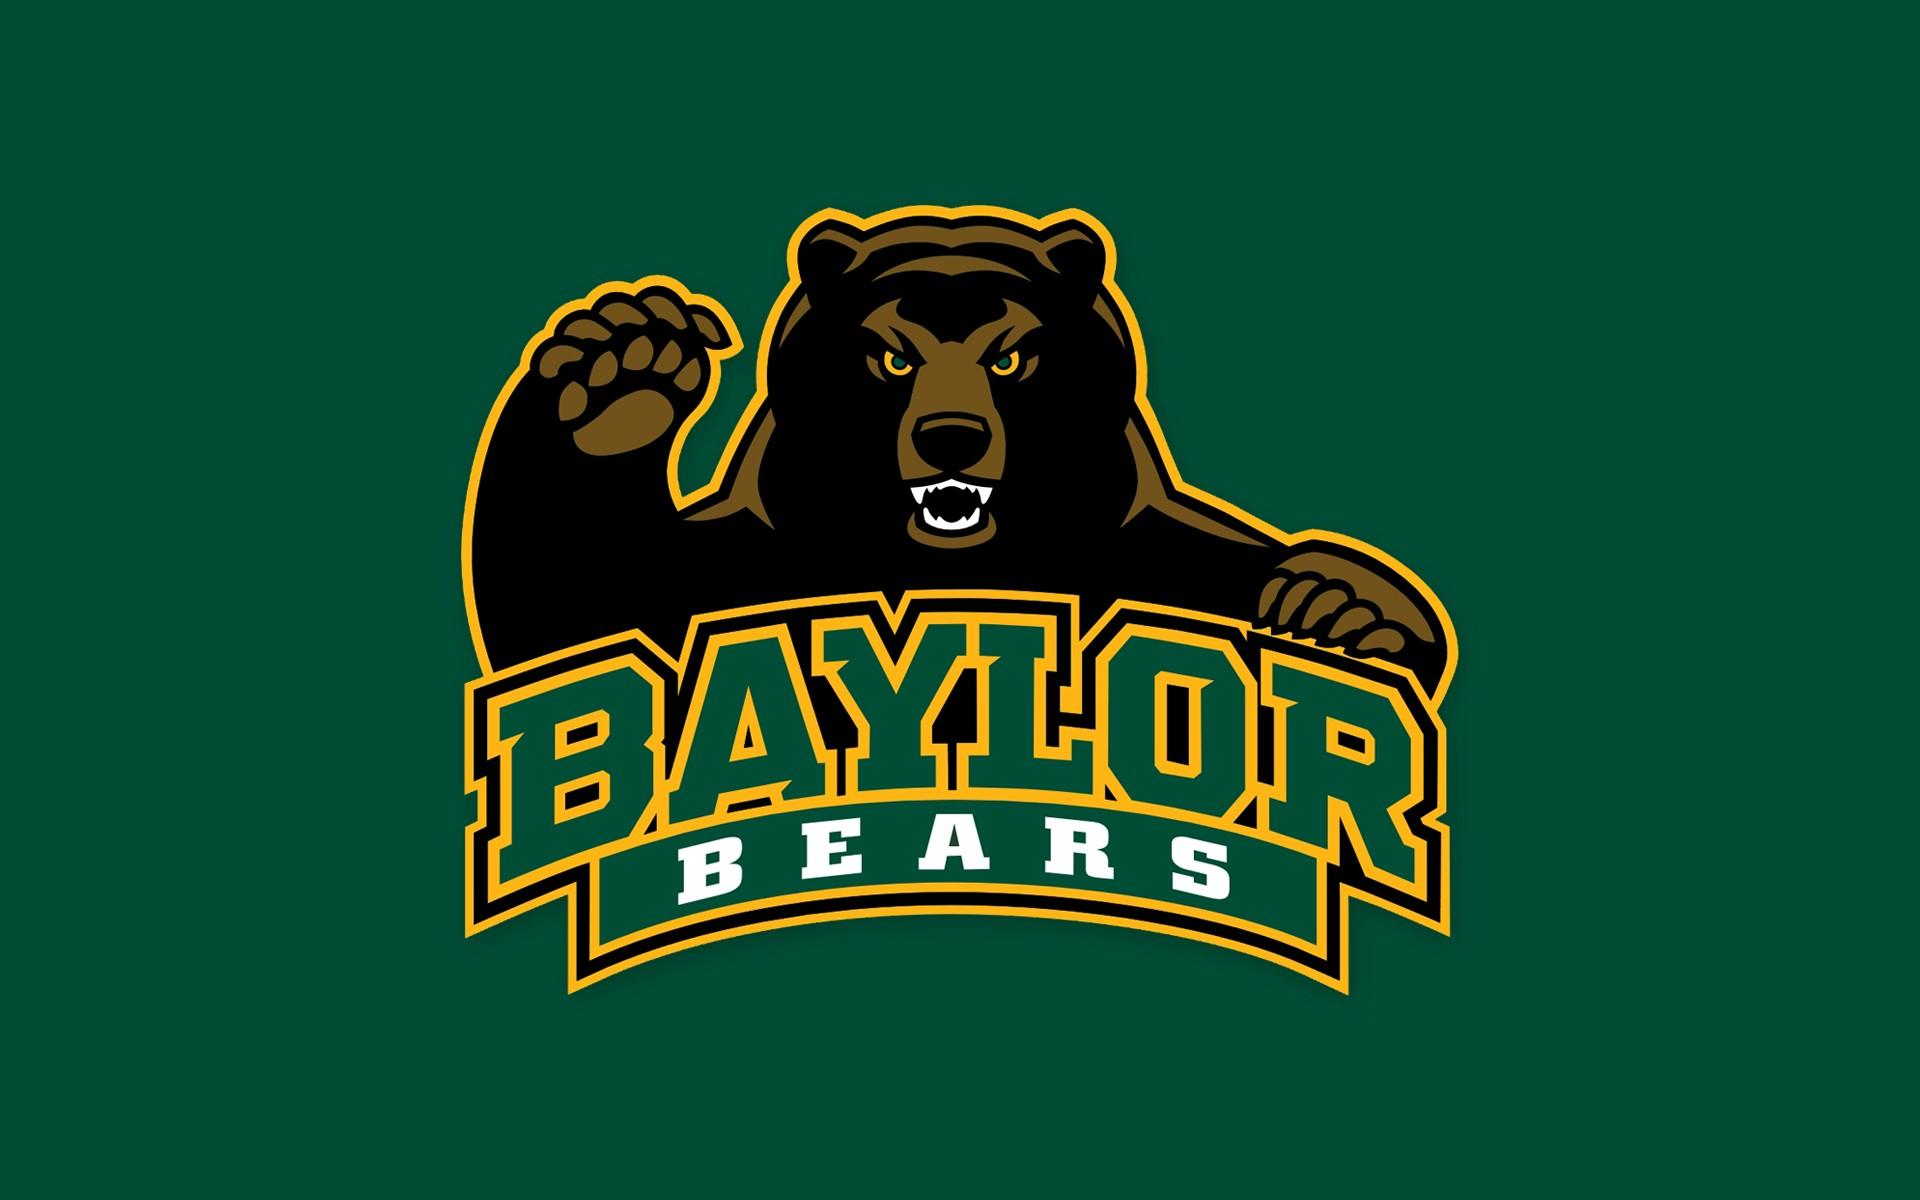 Baylor Bears Football Hd Wallpapers 1080p Baylor Bears Football 1920x1200